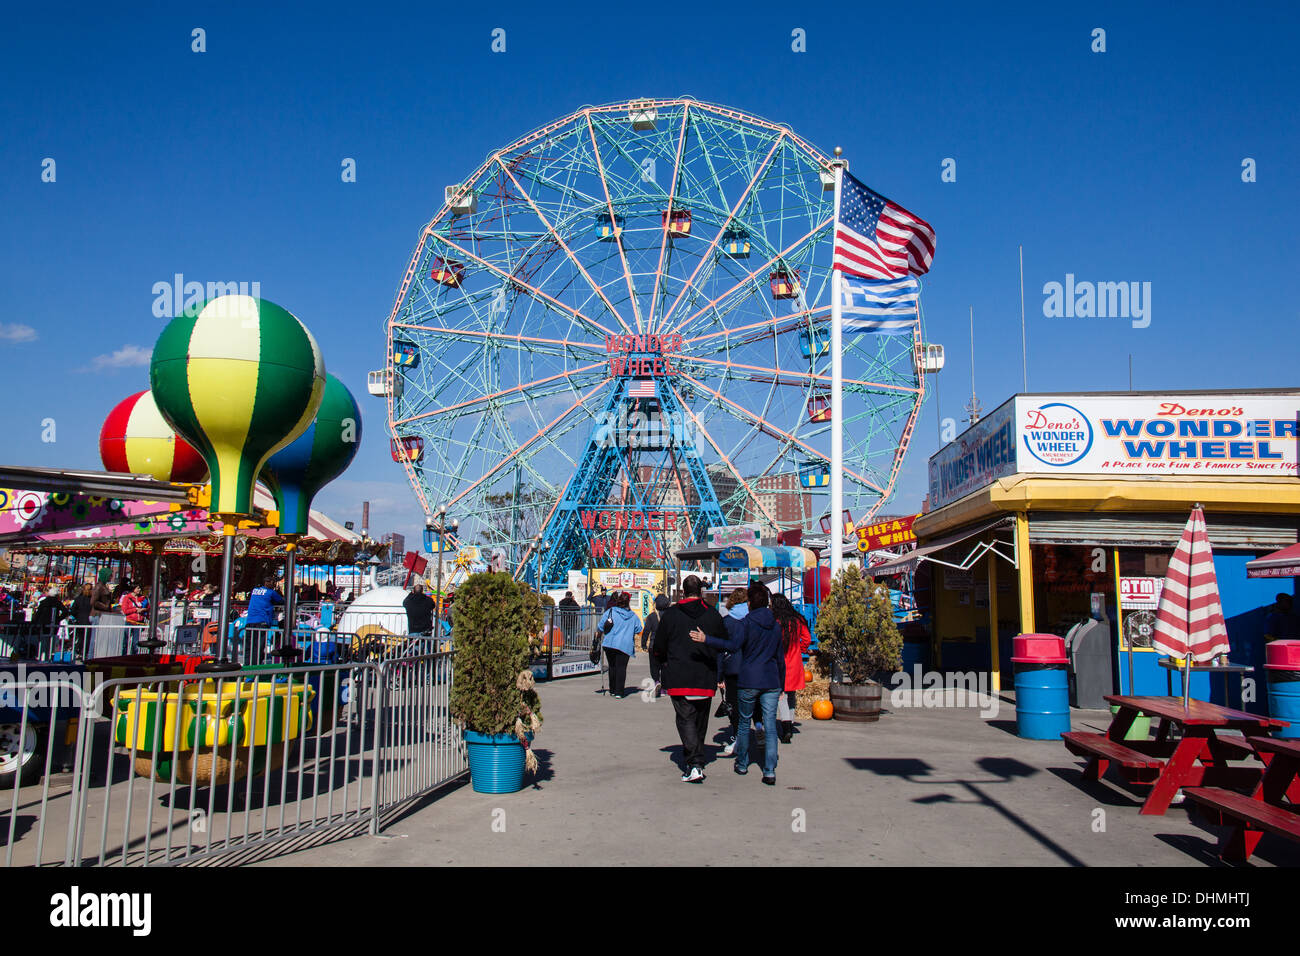 Wonder Wheel ferris wheel ride, Coney Island,Brooklyn, New York,United States of America. - Stock Image